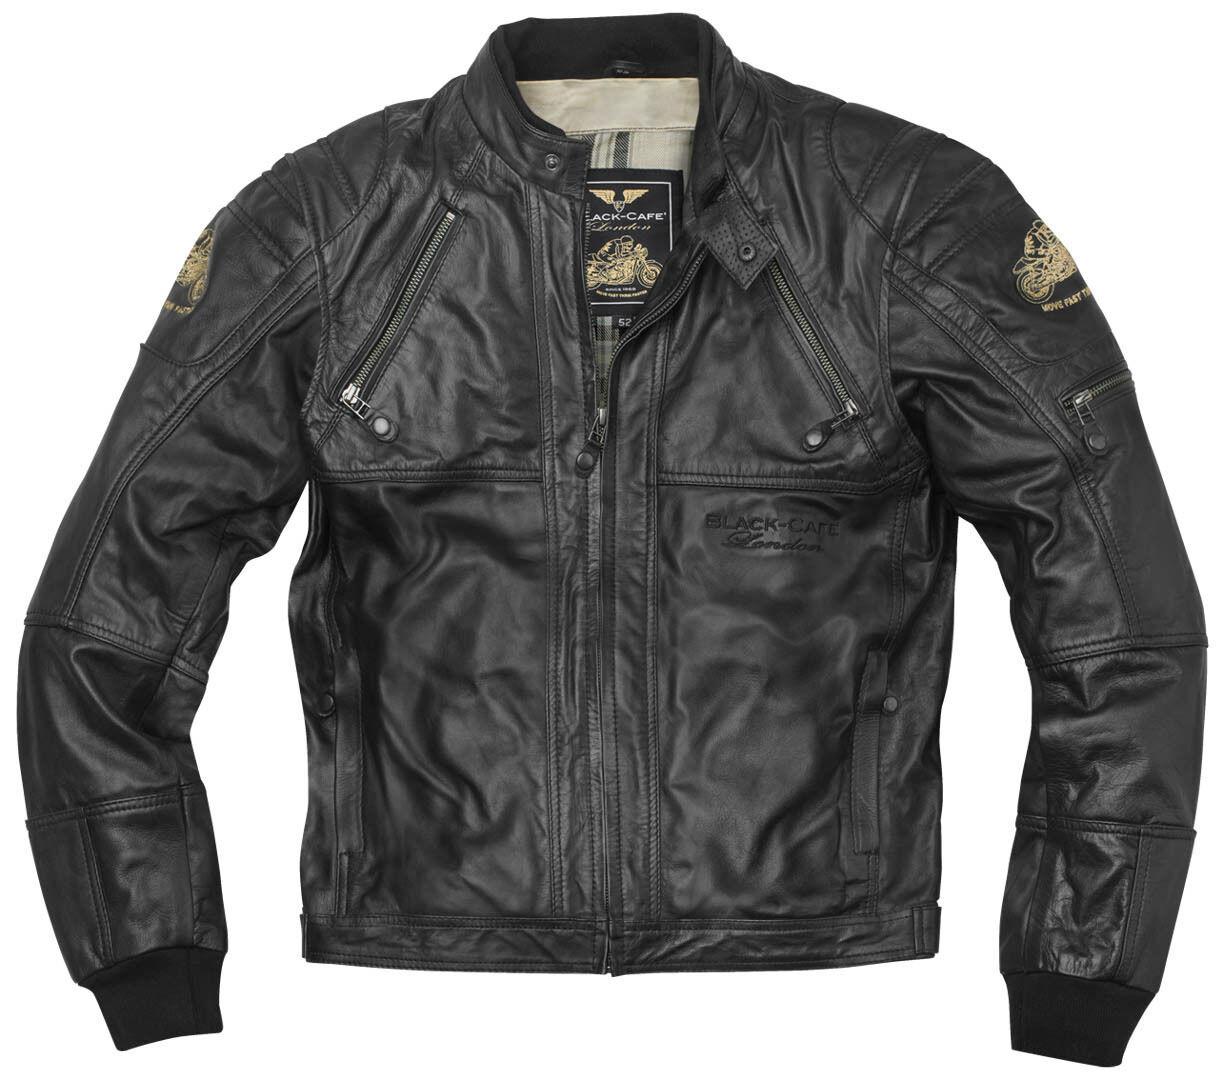 Black-Cafe London Dallas Veste en cuir de moto Noir taille : 50